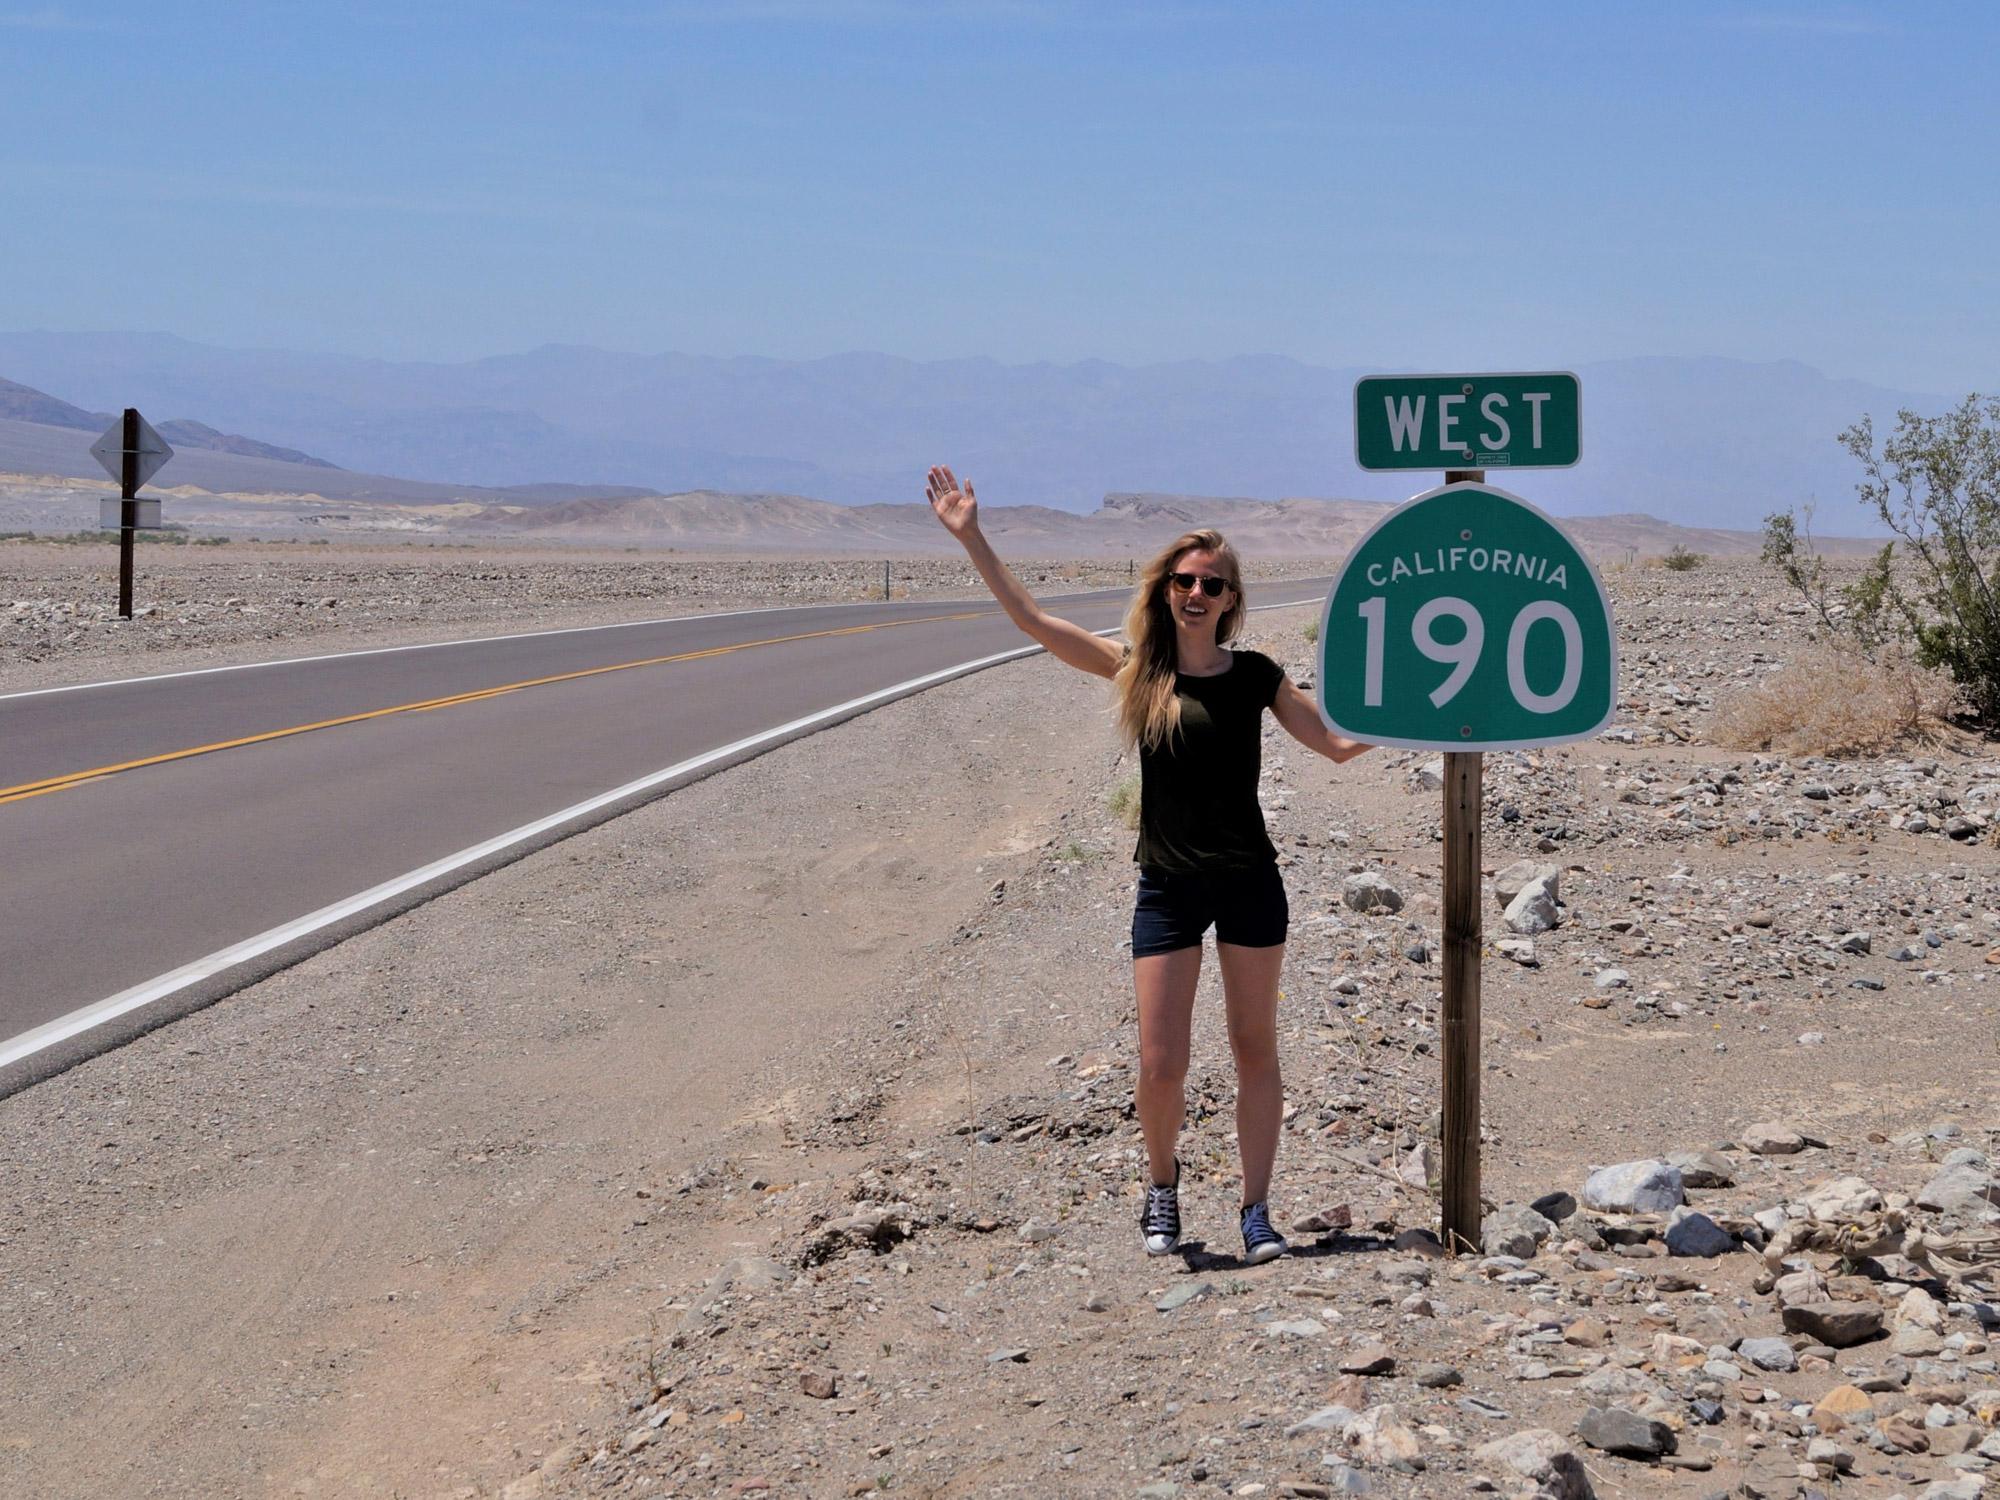 Brenda - Death Valley, USA